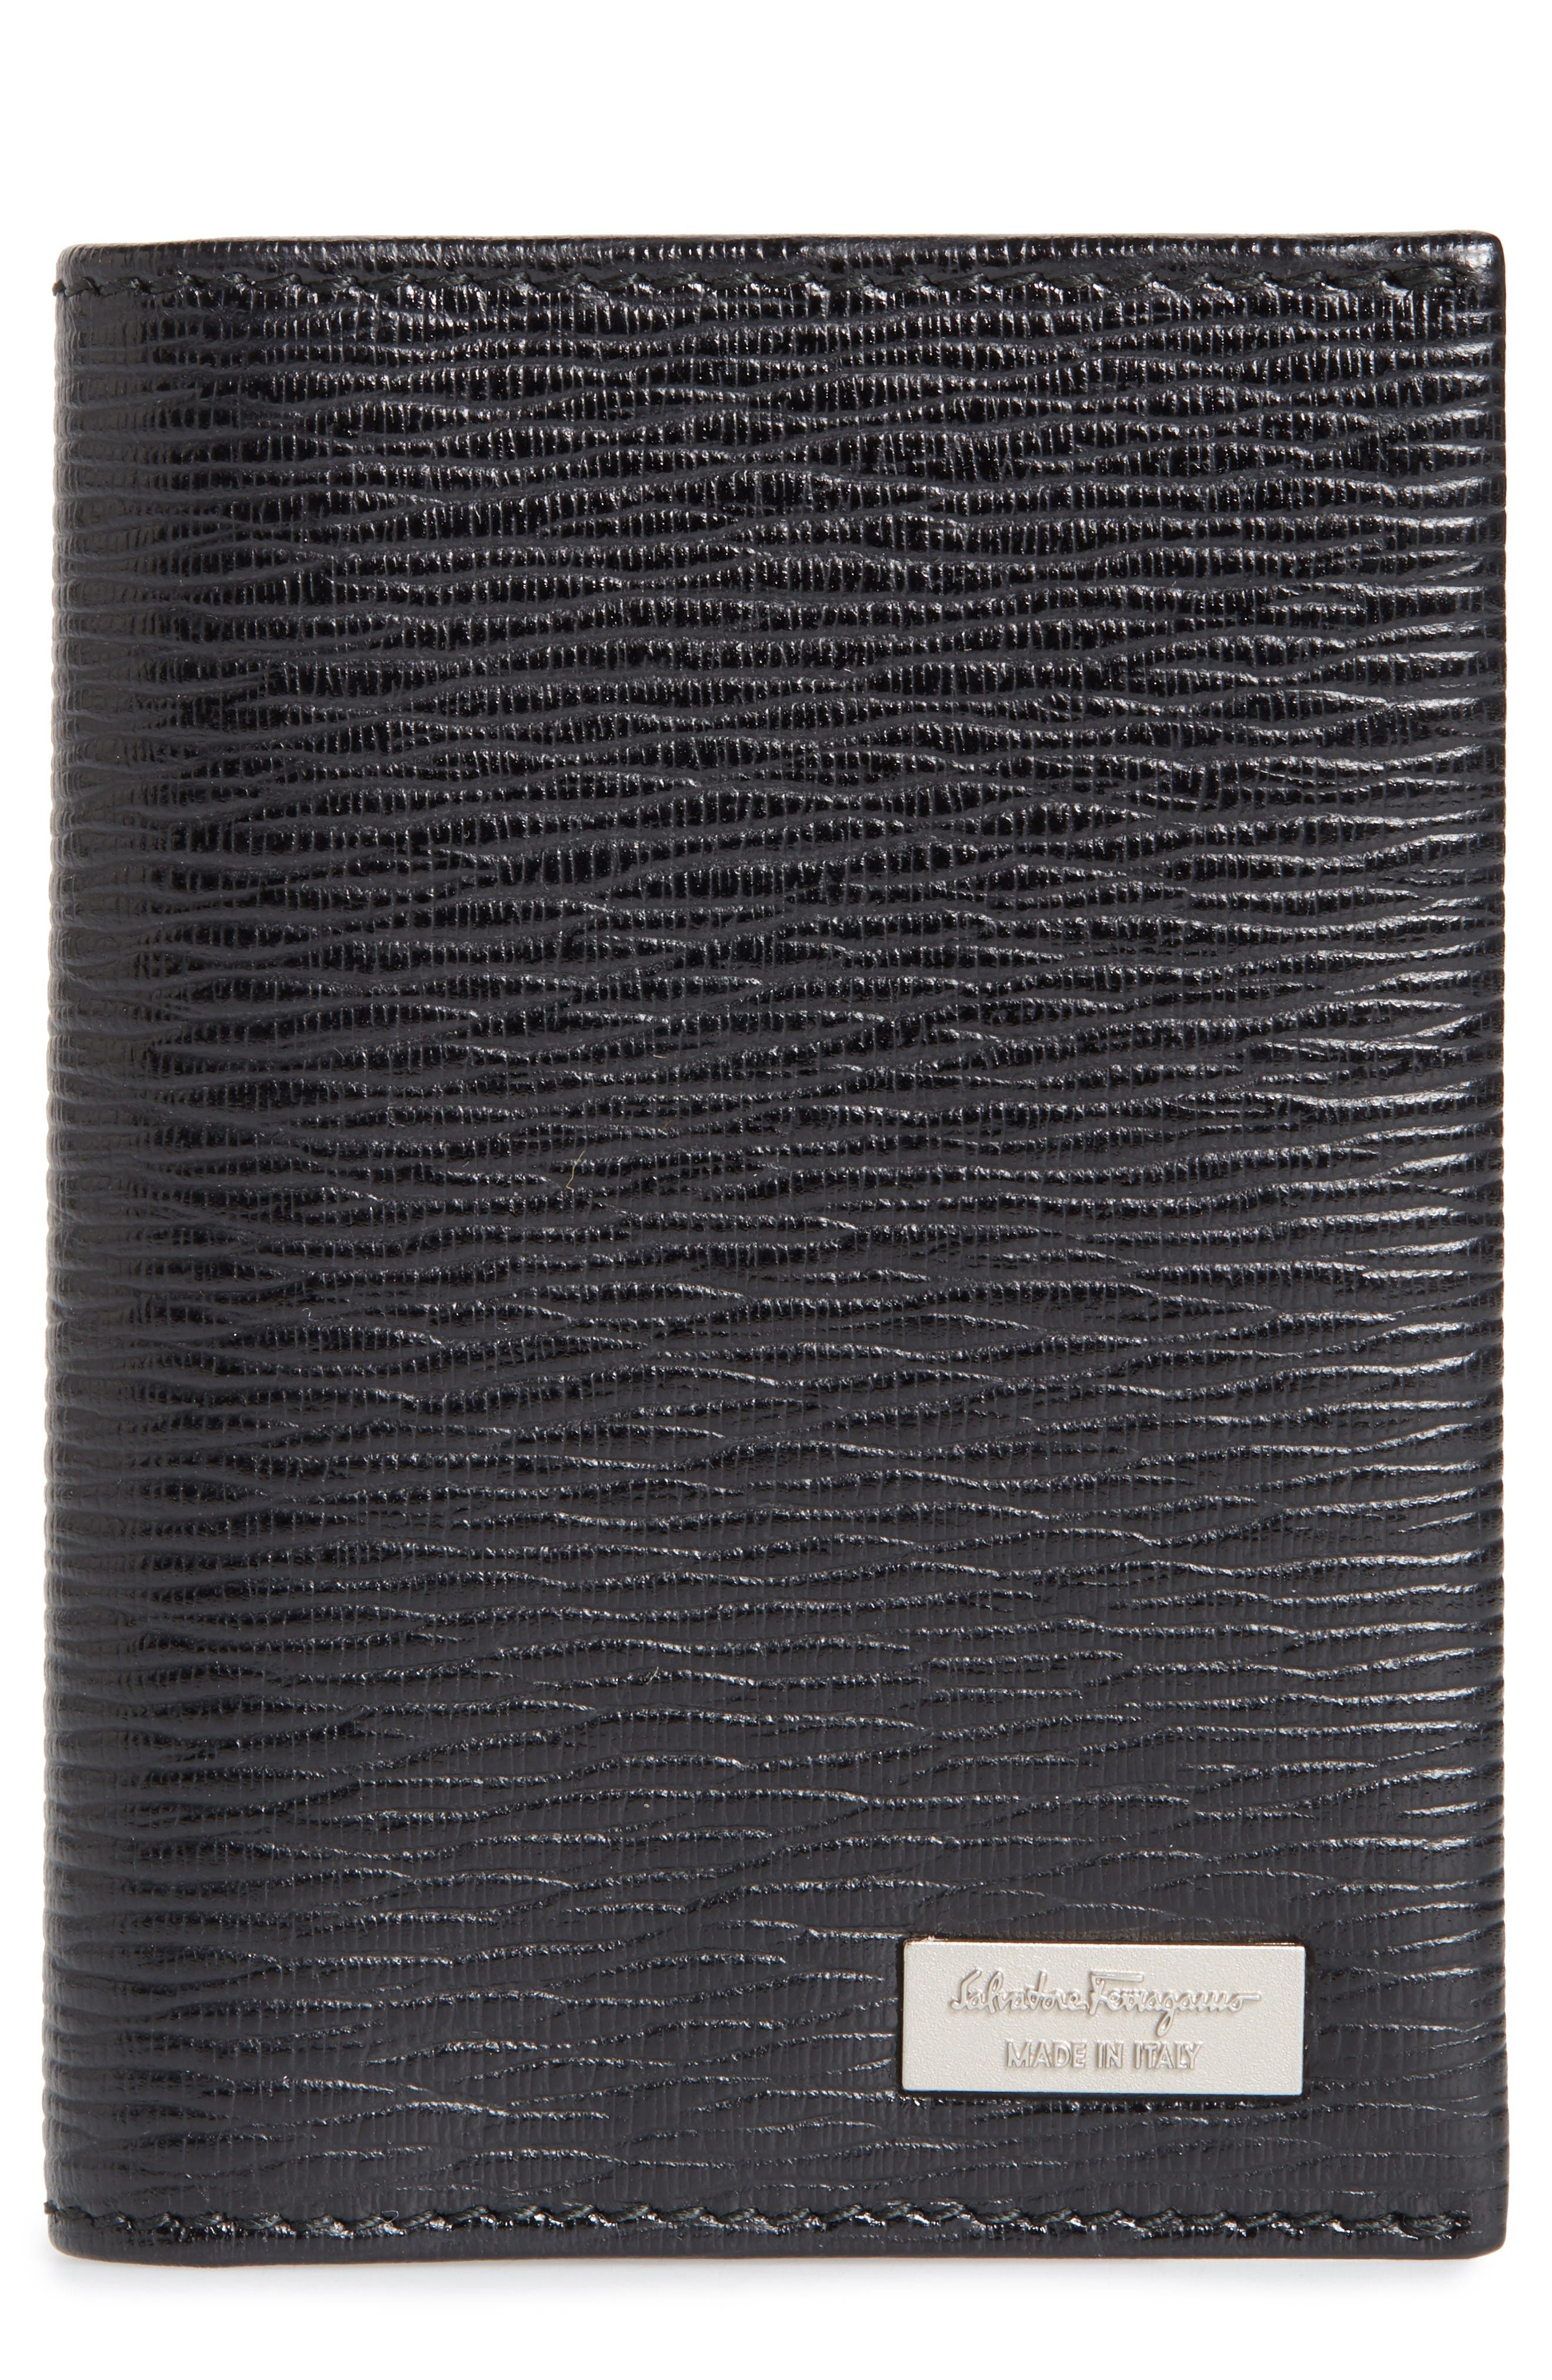 Main Image - Salvatore Ferragamo Revival Leather Folding Card Case